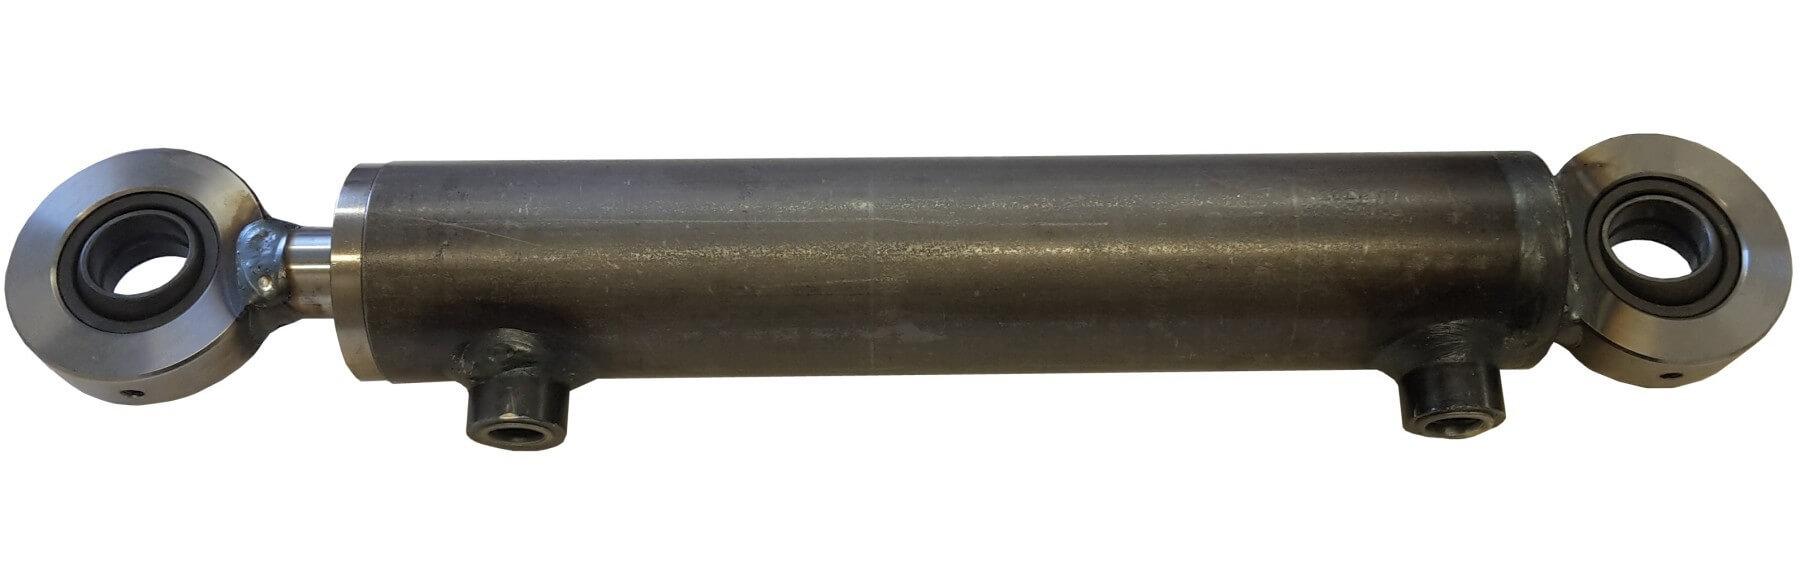 Hydraulisylinteri CL 50. 30. 400 GE